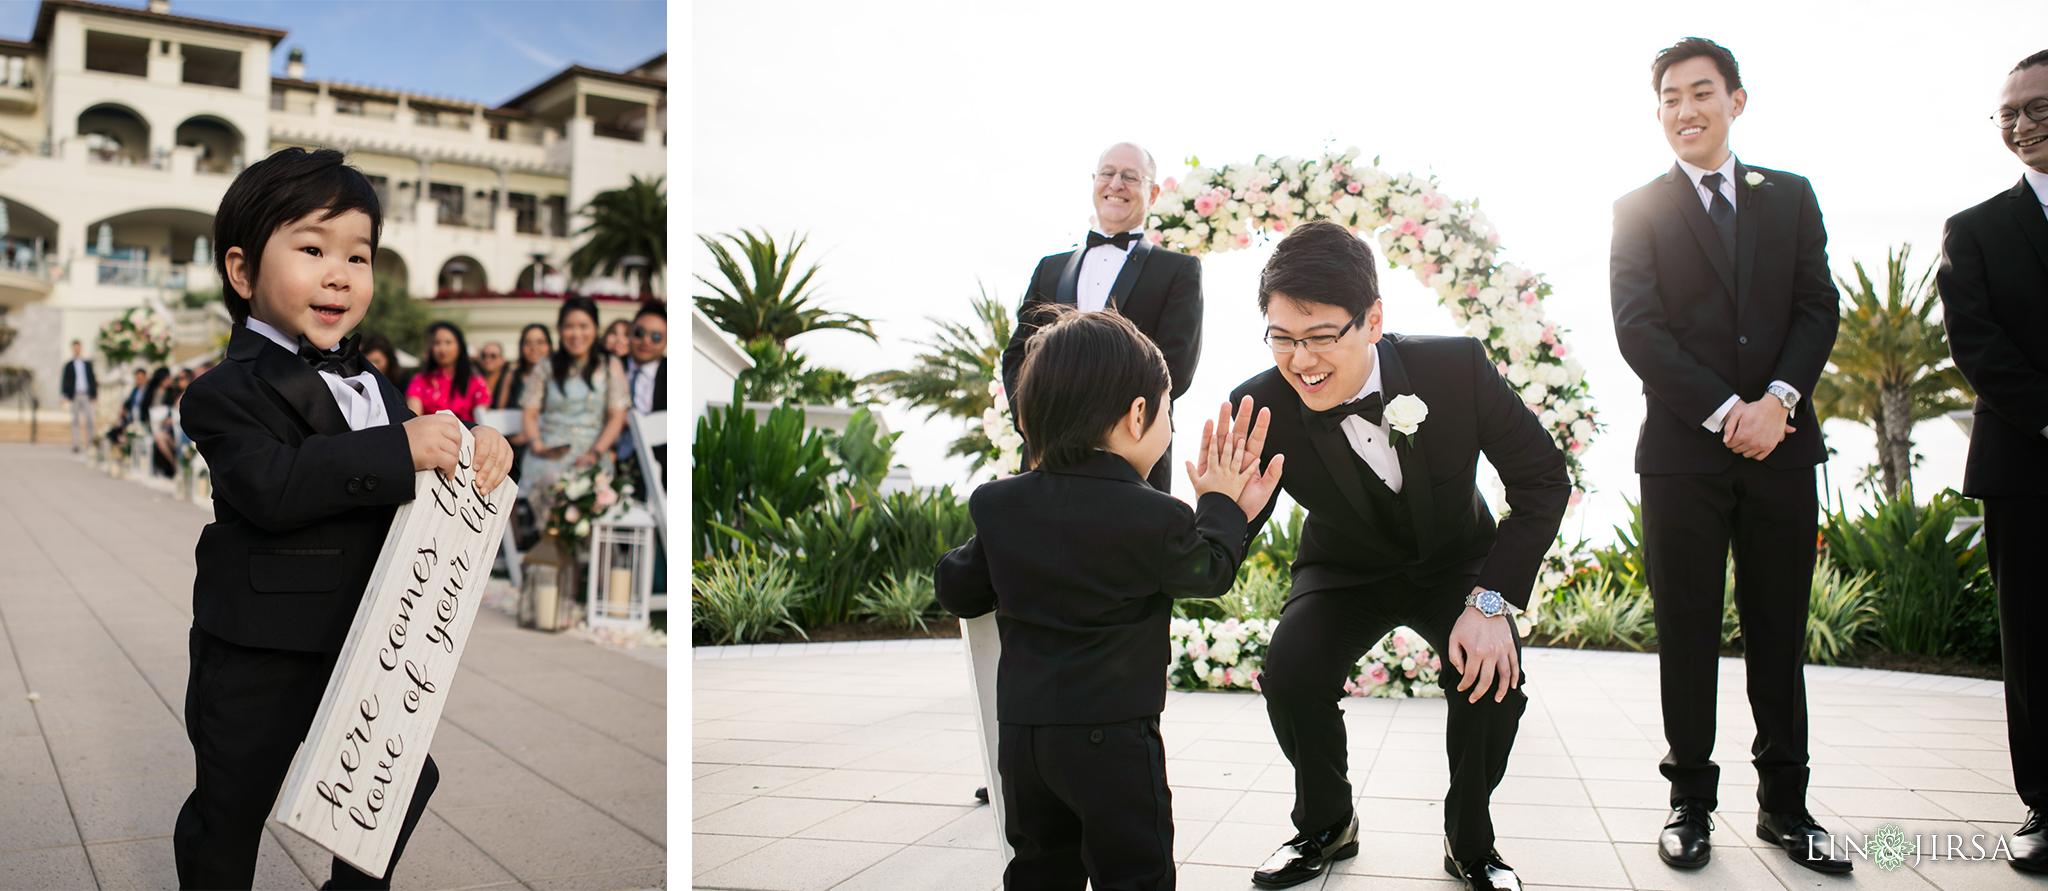 21 Monarch Beach Resort Dana Point Wedding Photography